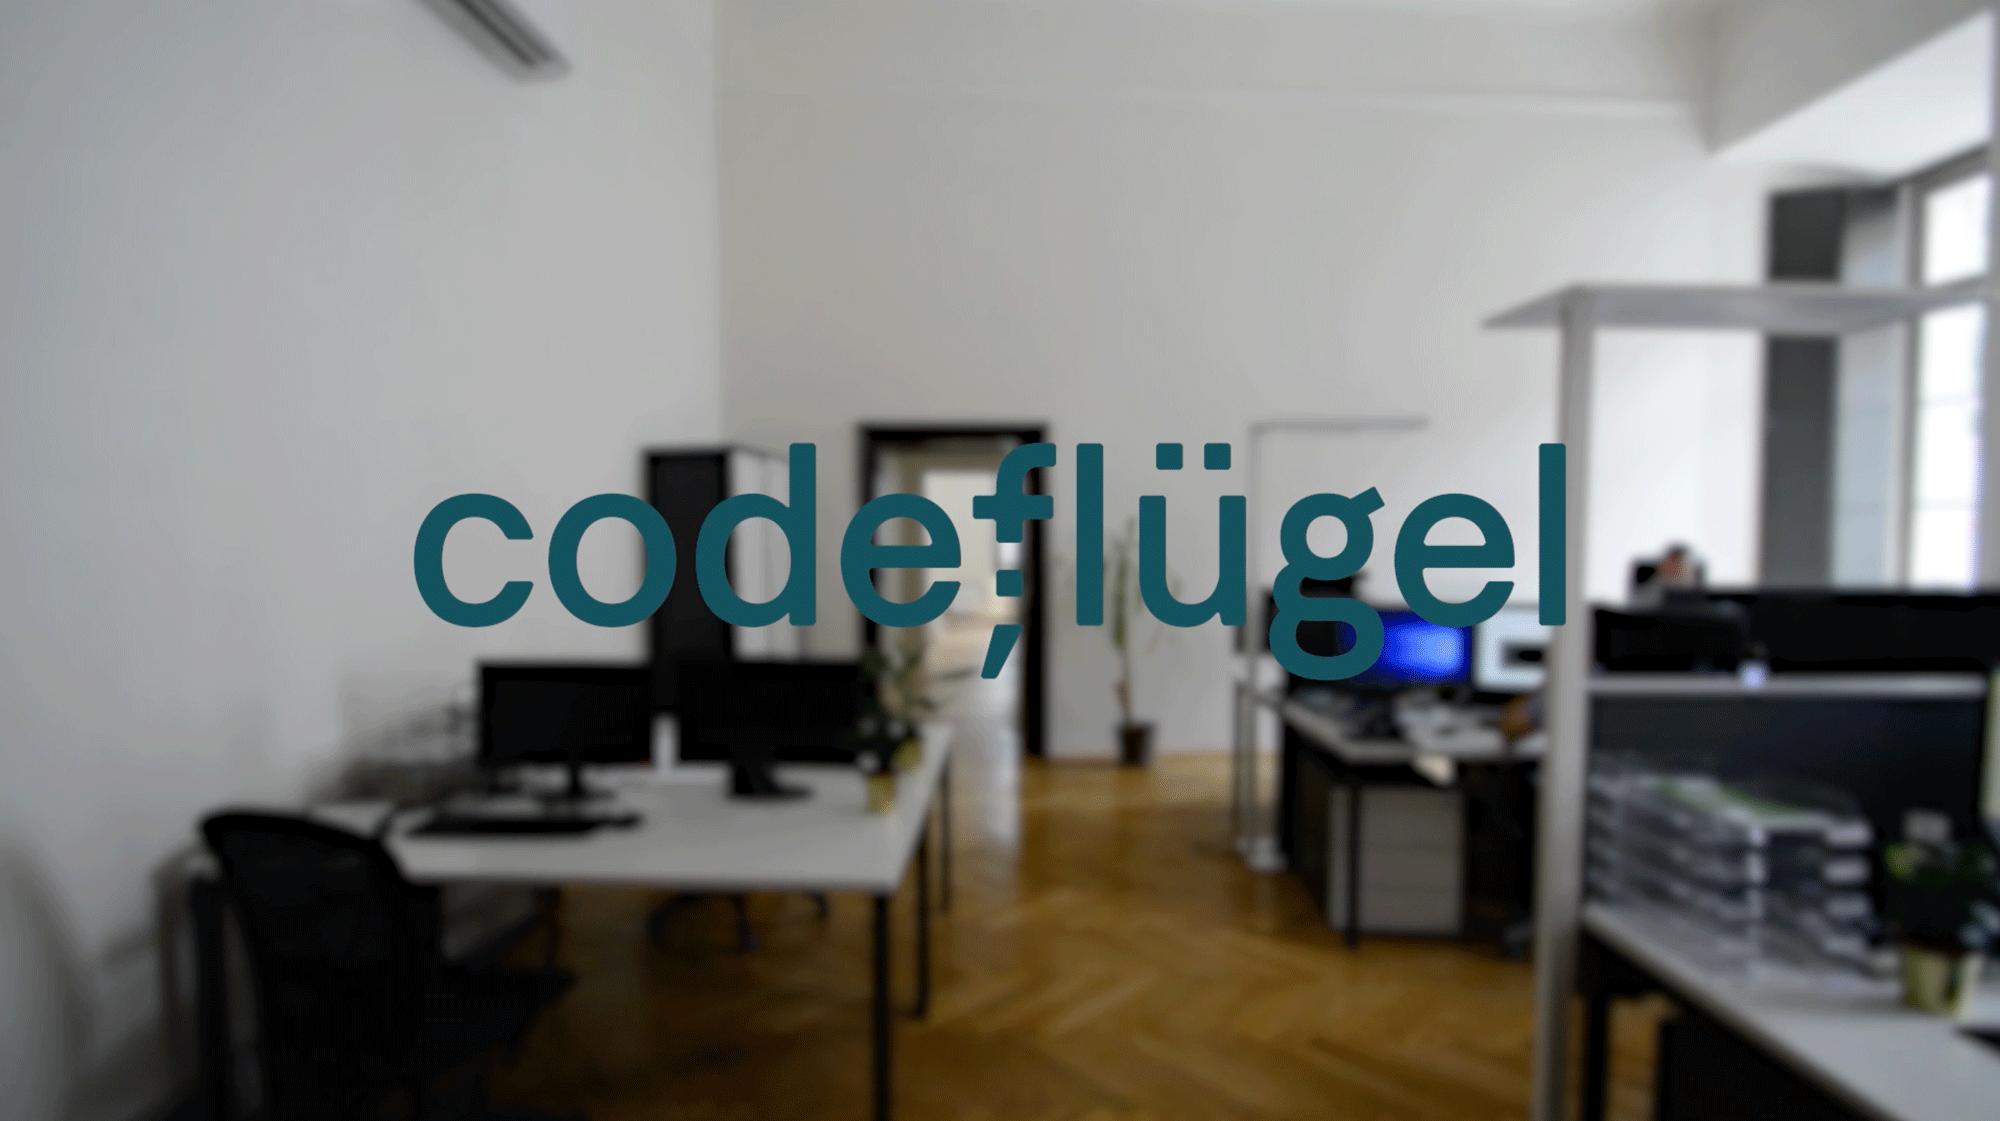 Codeflügel Image Video